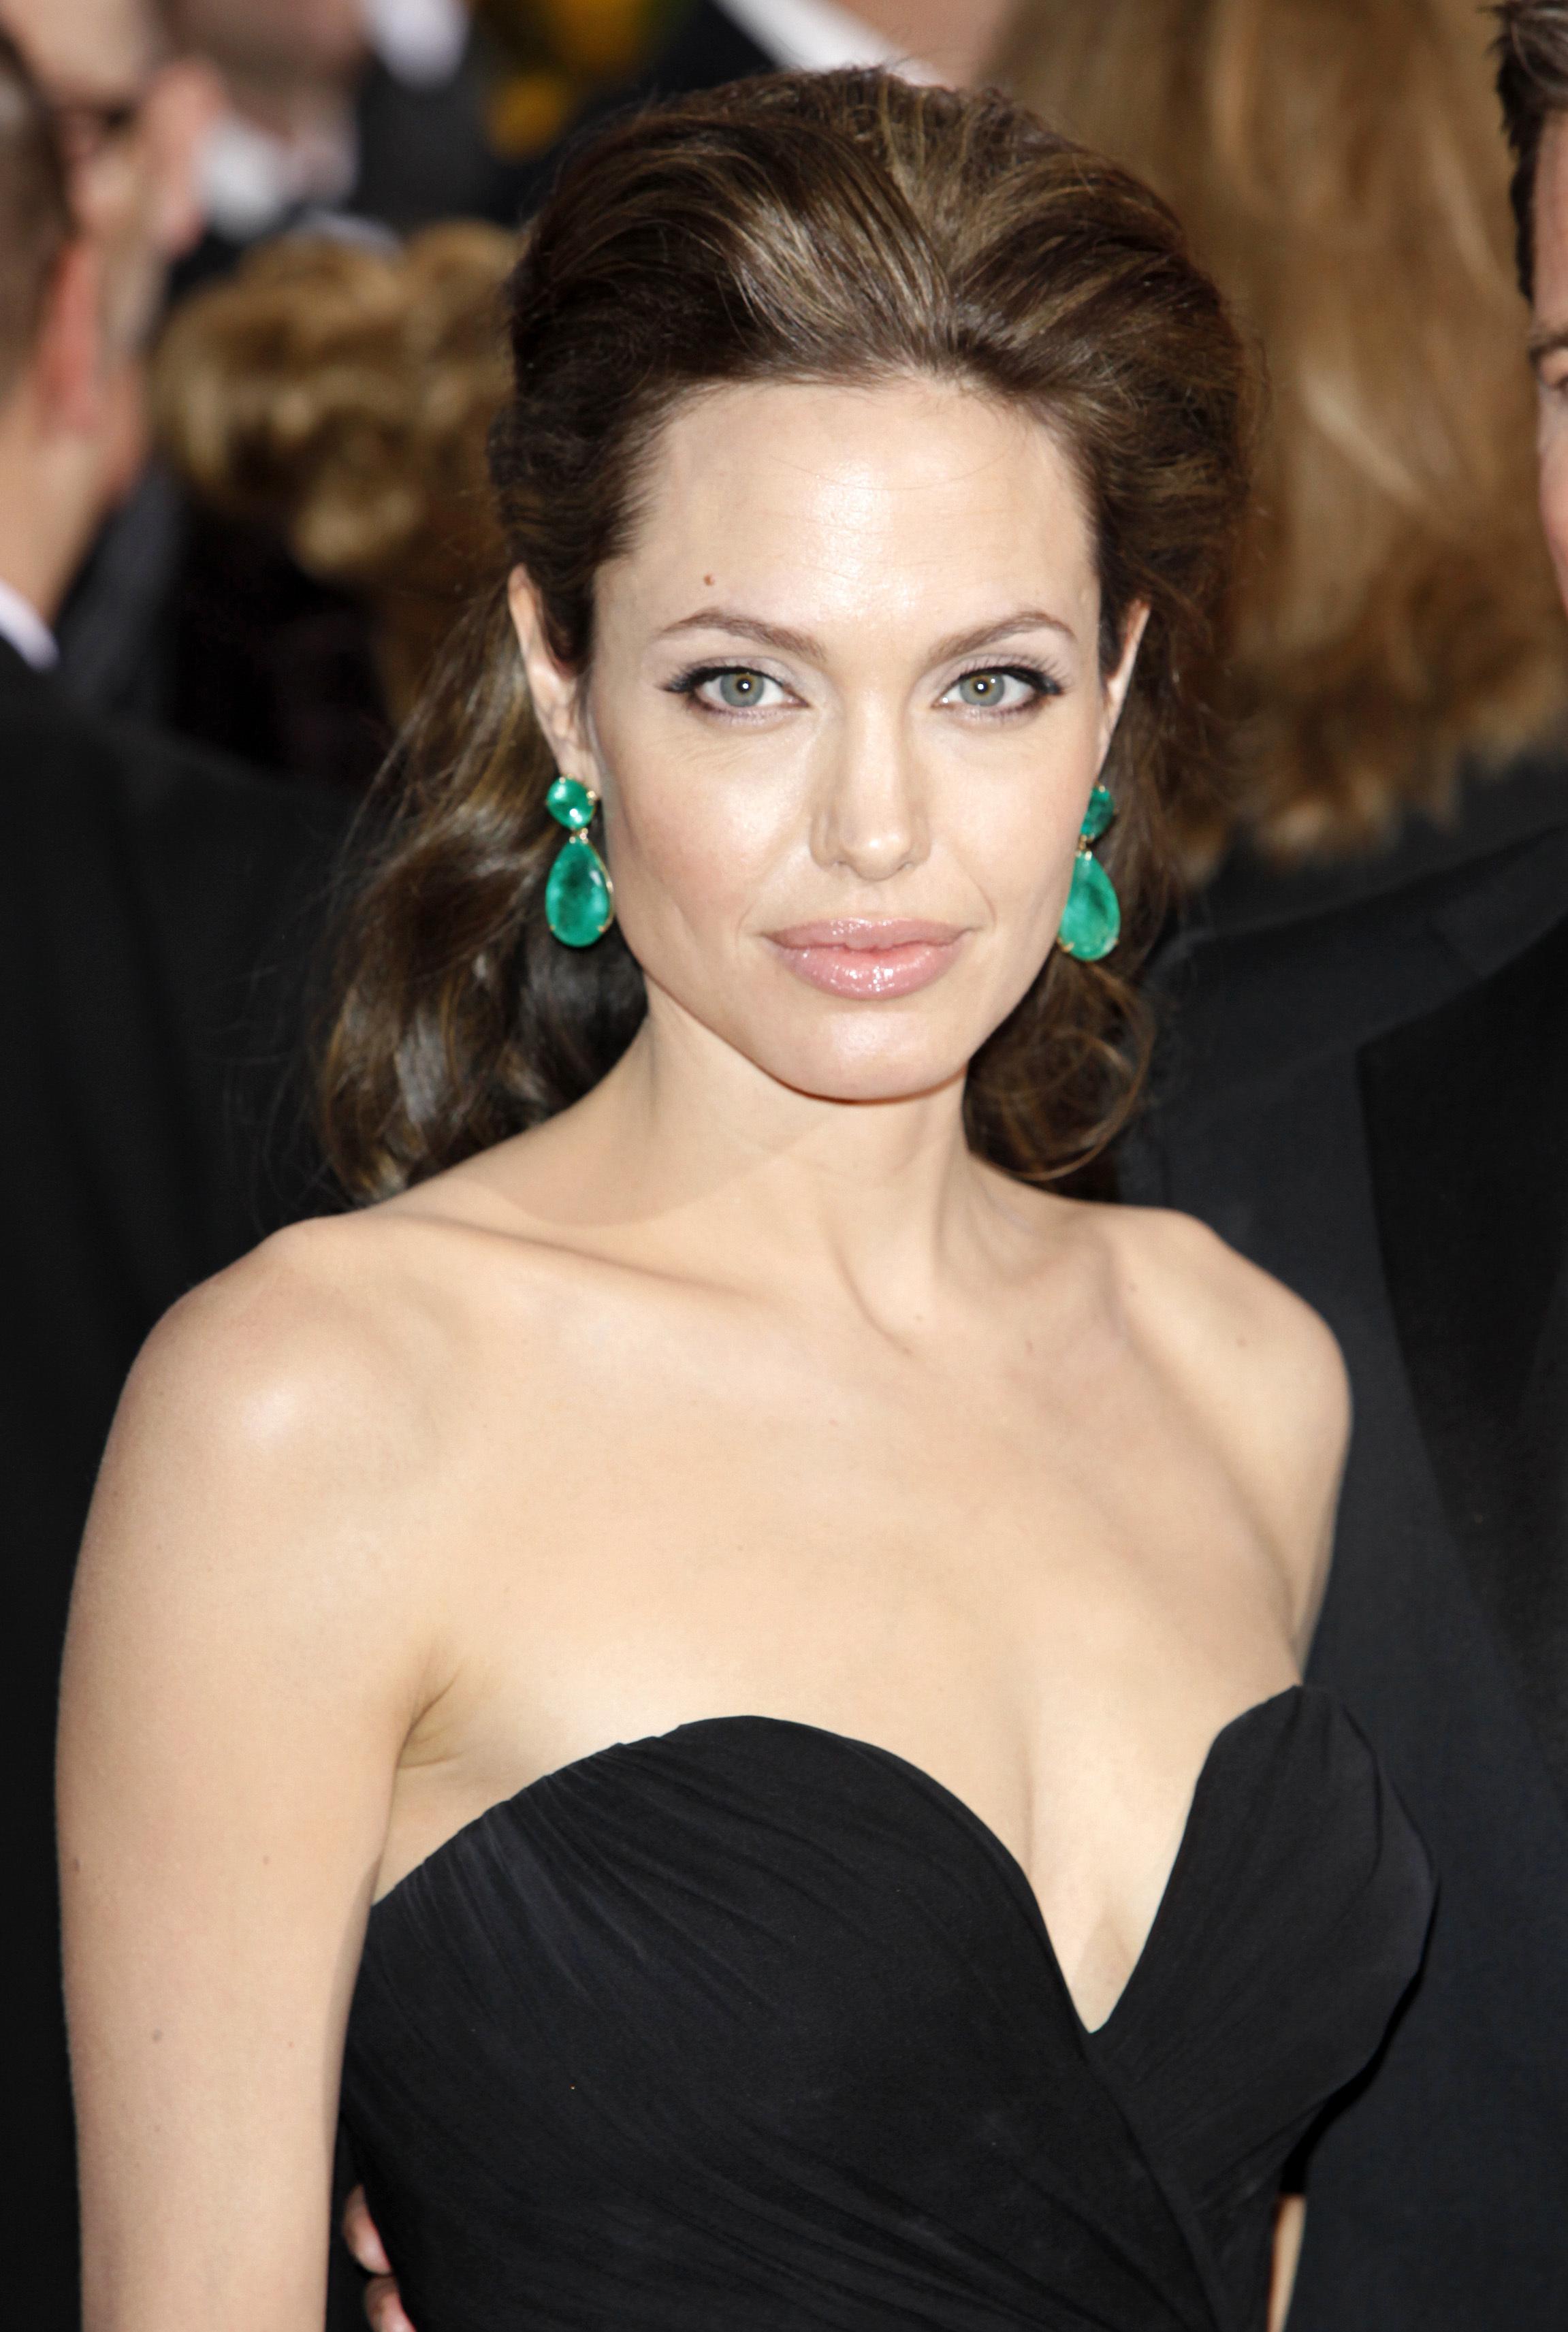 أنجيلينا جولي Angelina Jolie بأقراط من لورين شوارتز Lorraine Schwartz